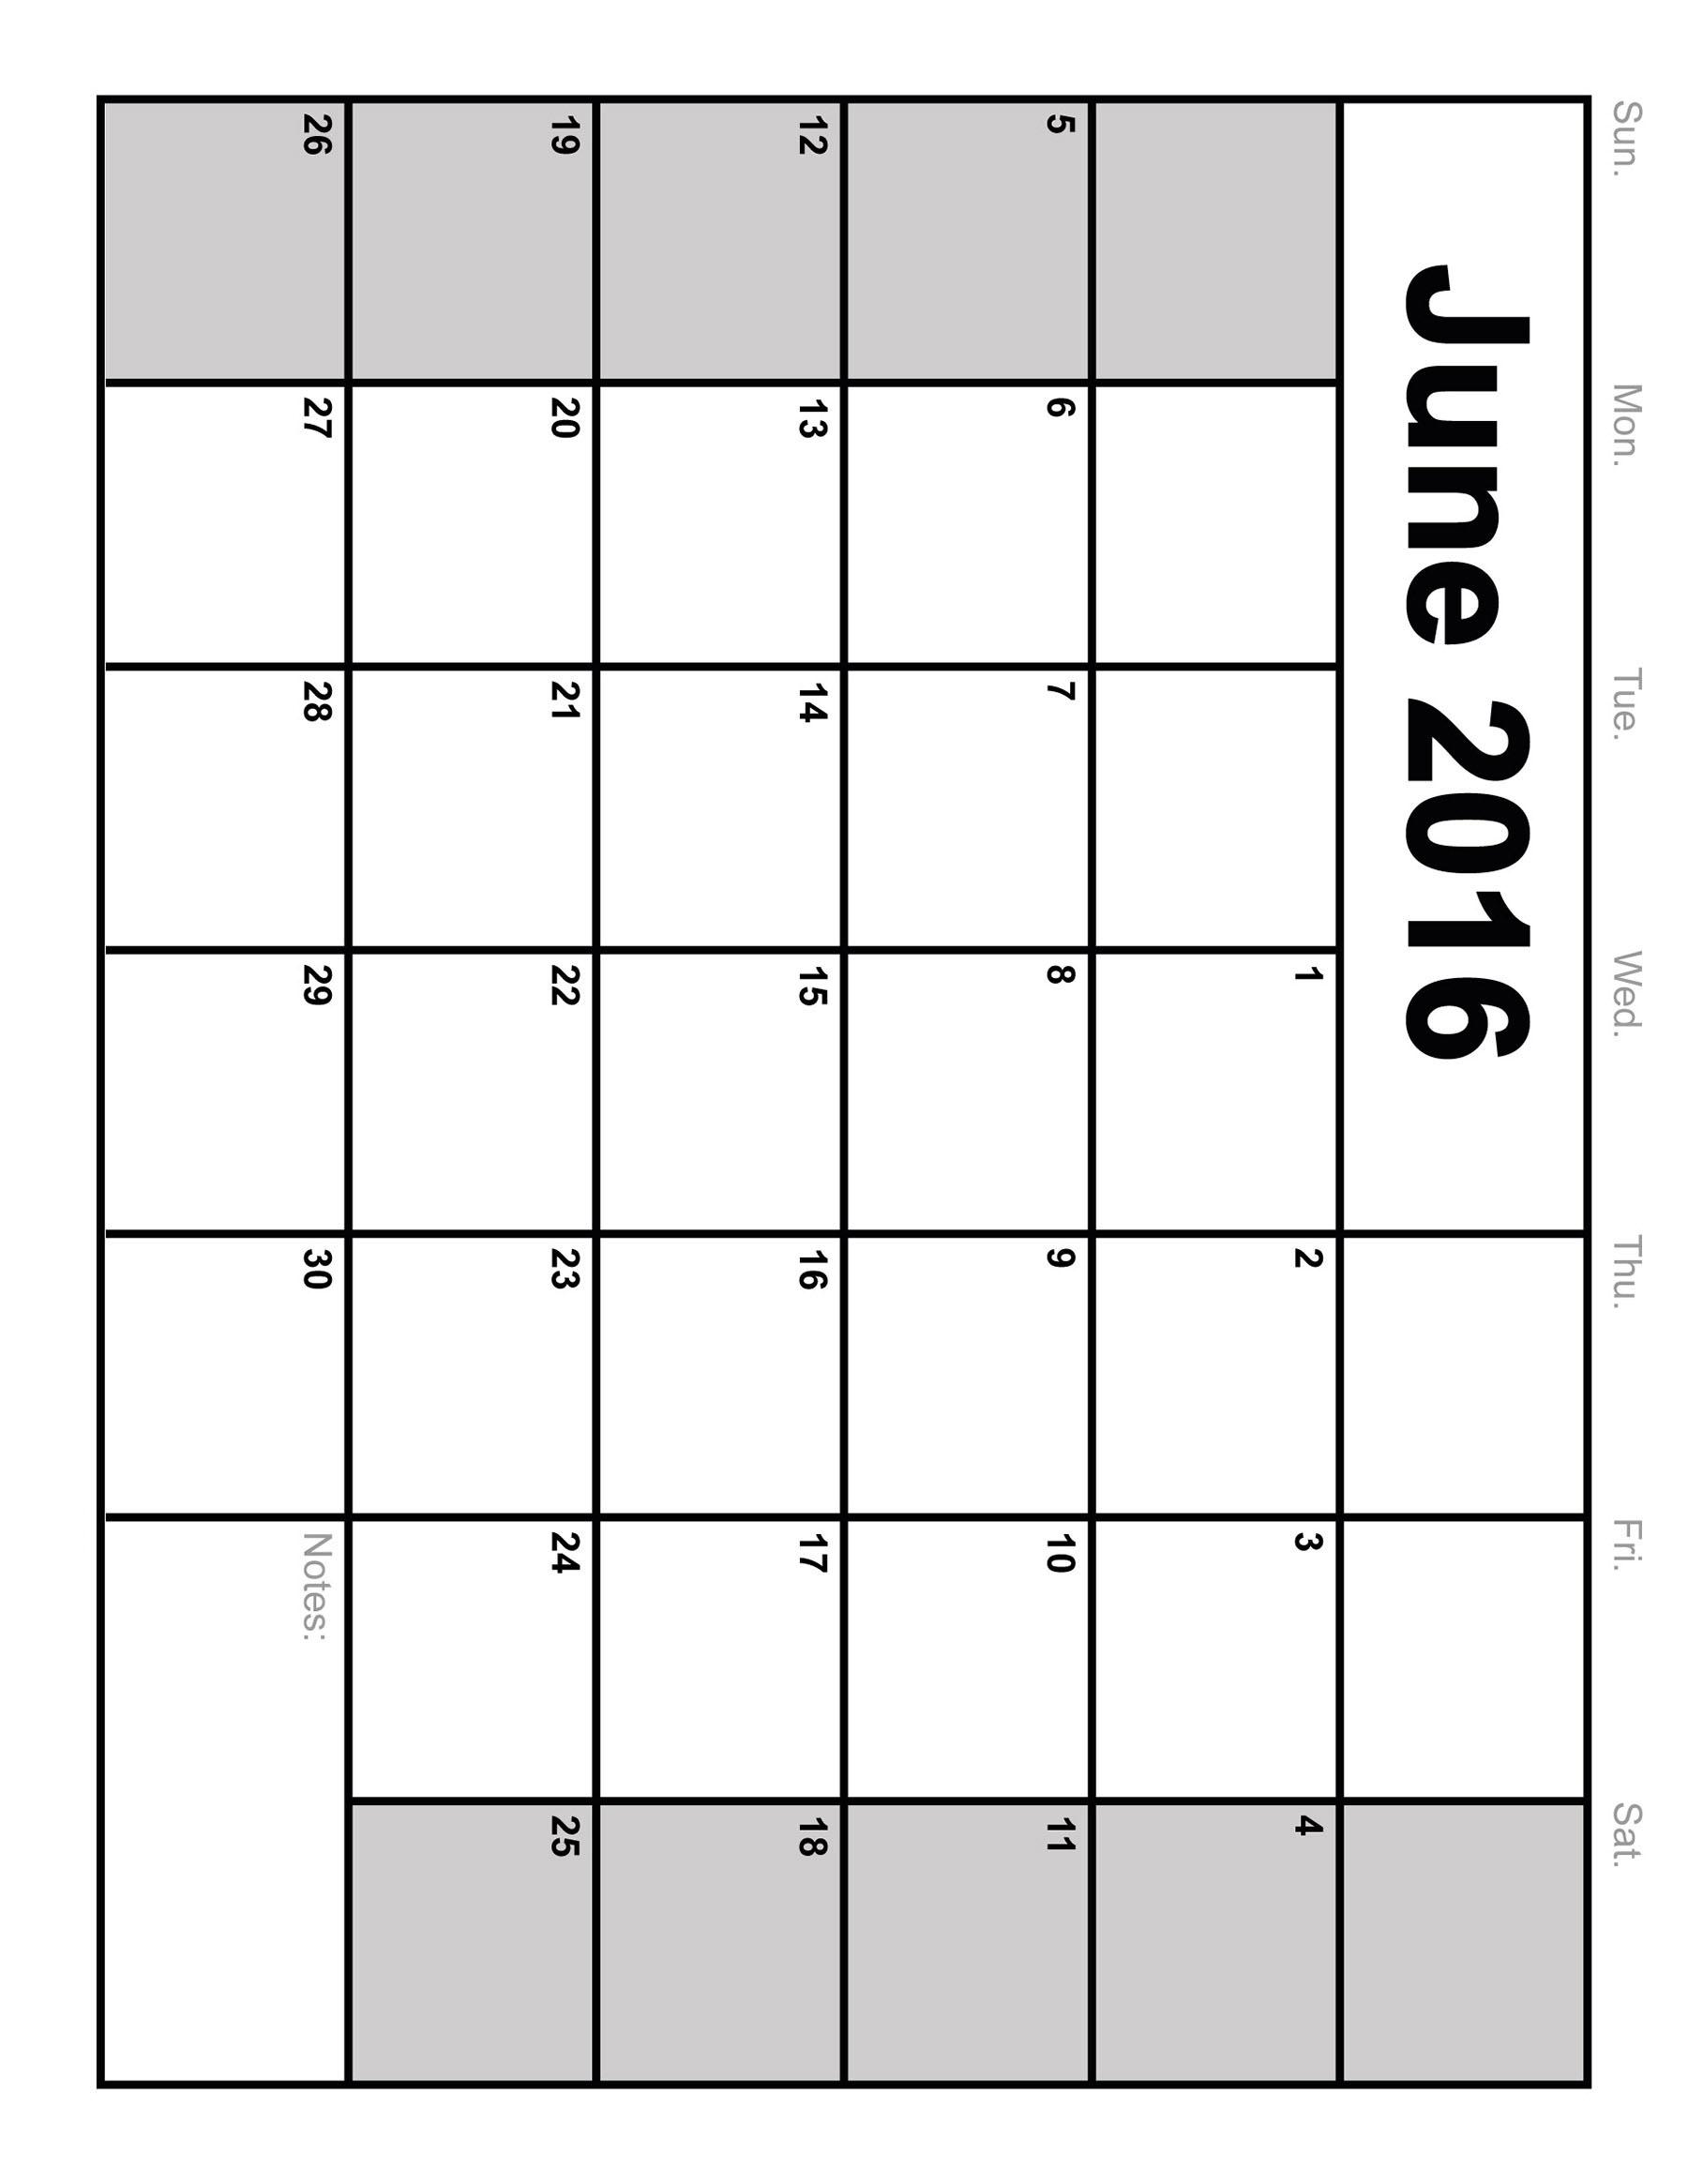 9 Images of Printable Blank Calendar June 2016